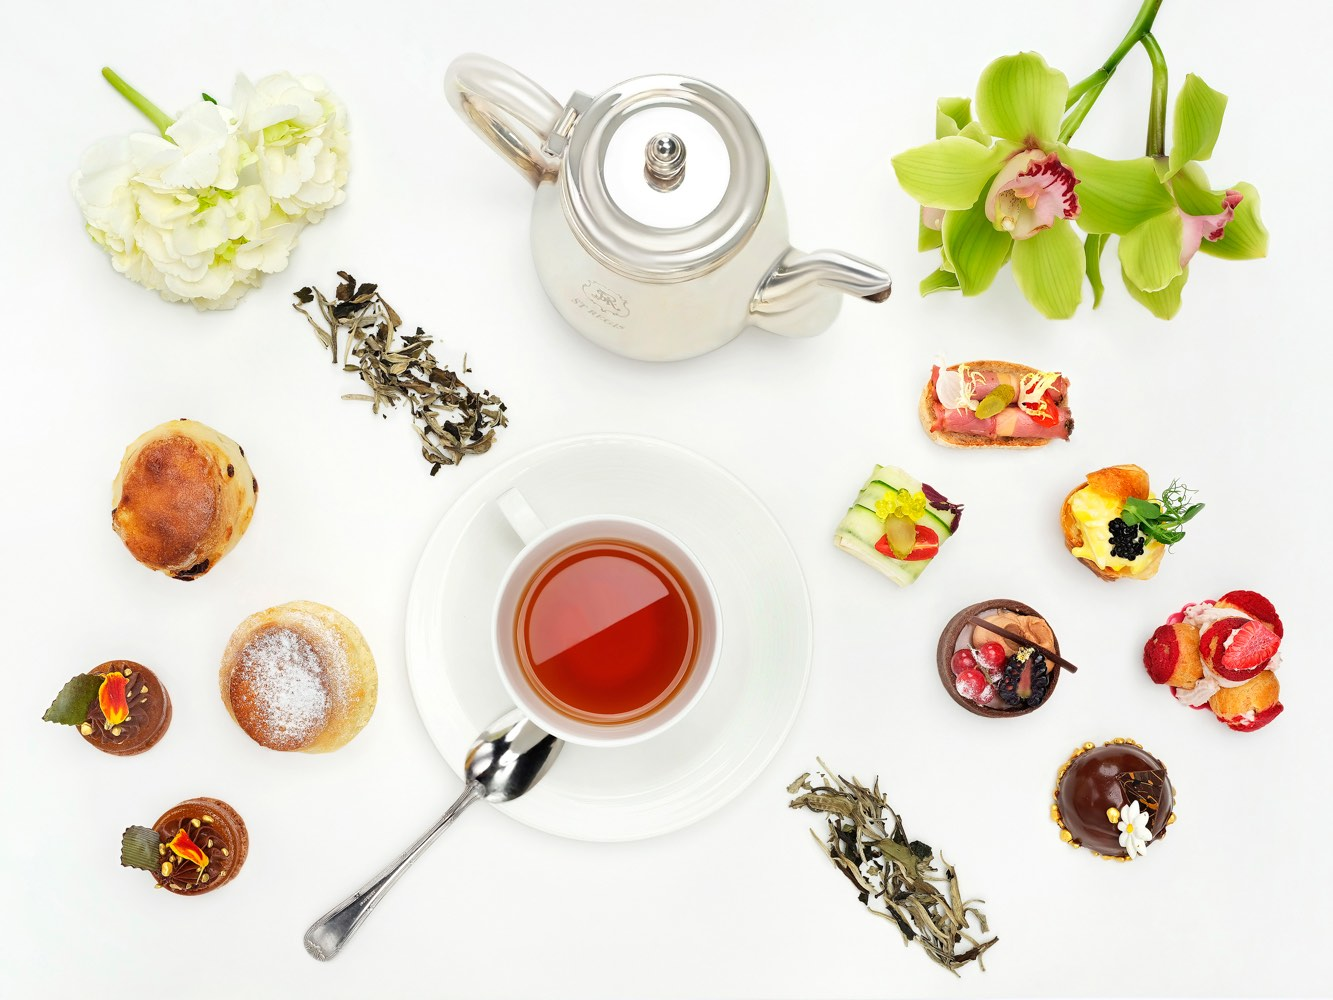 ST REGIS Afternoon Tea Food Photography Singapore COCO Creative Studio